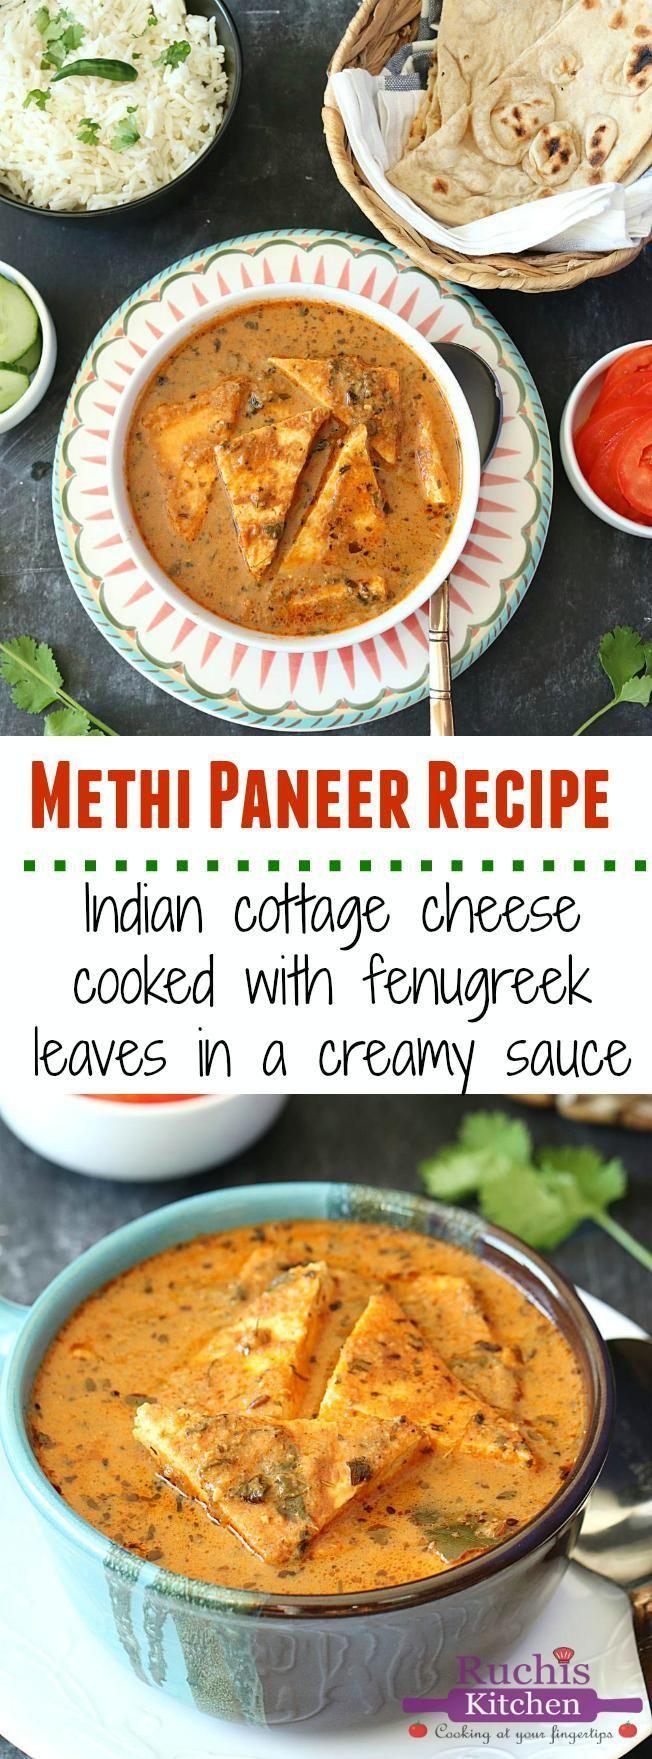 Methi paneer recipe paneer recipes cottage cheese and tofu forumfinder Gallery